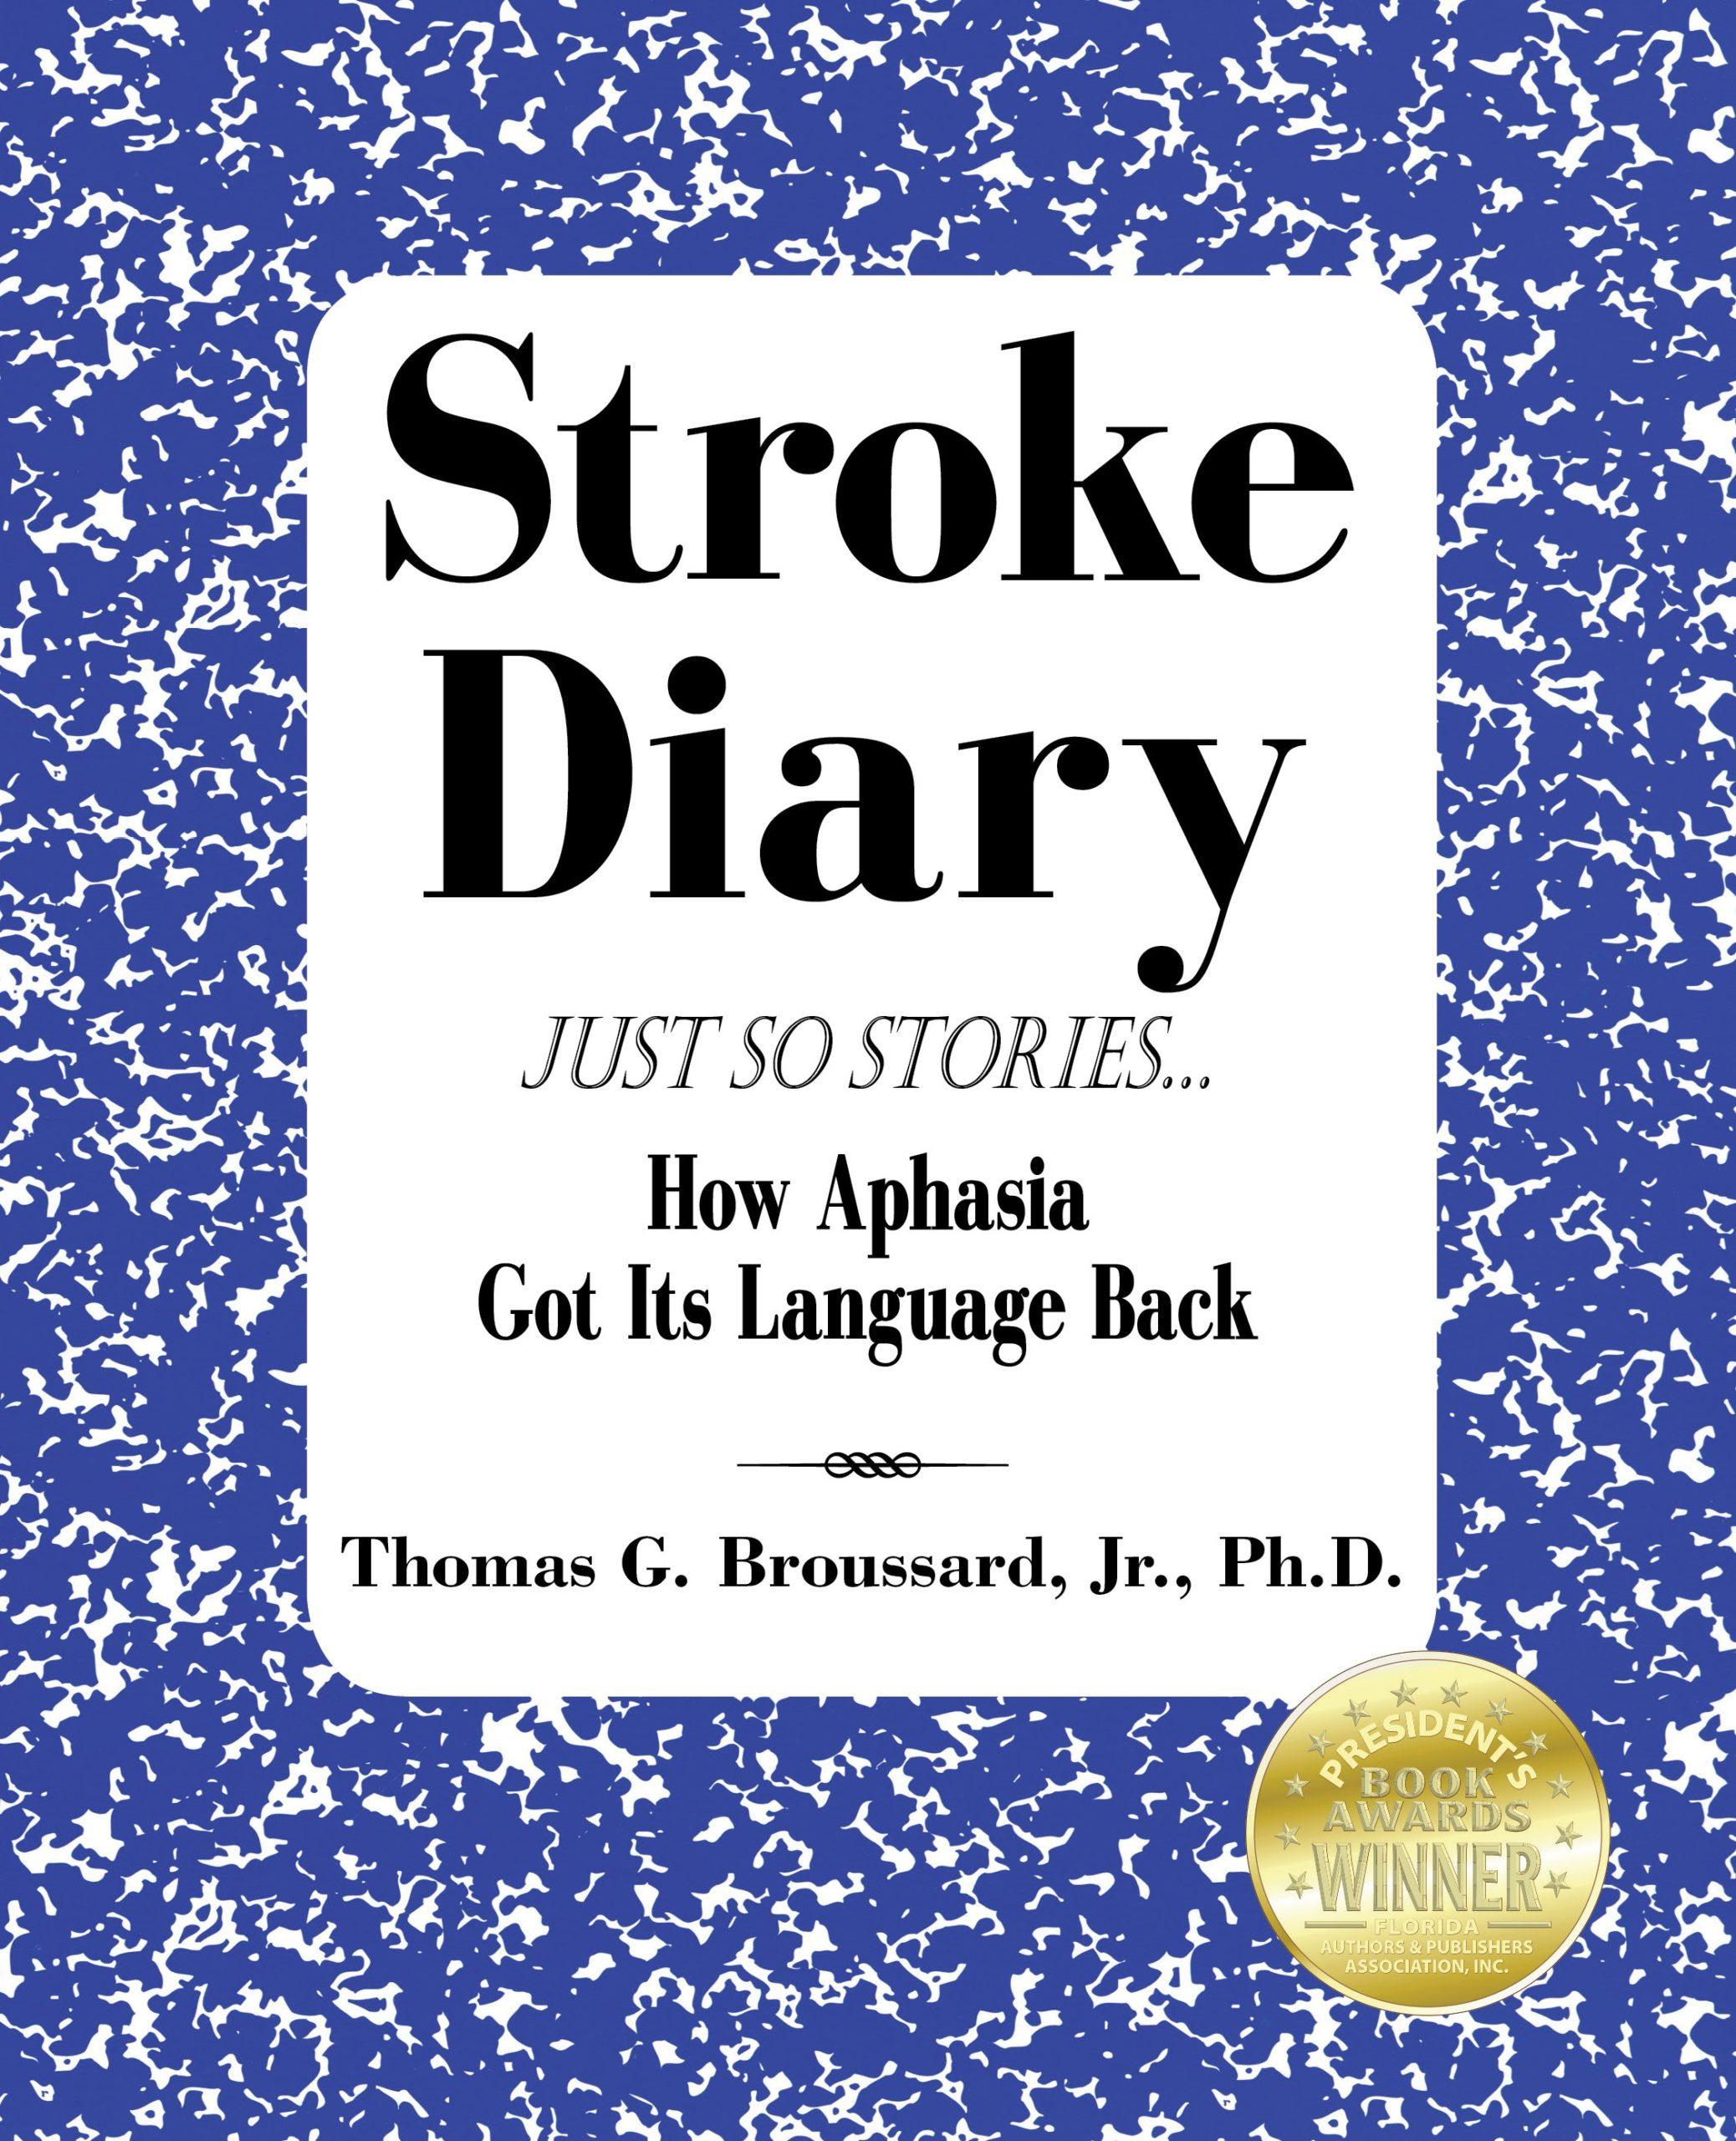 Stroke Diary Vol 3 Cover